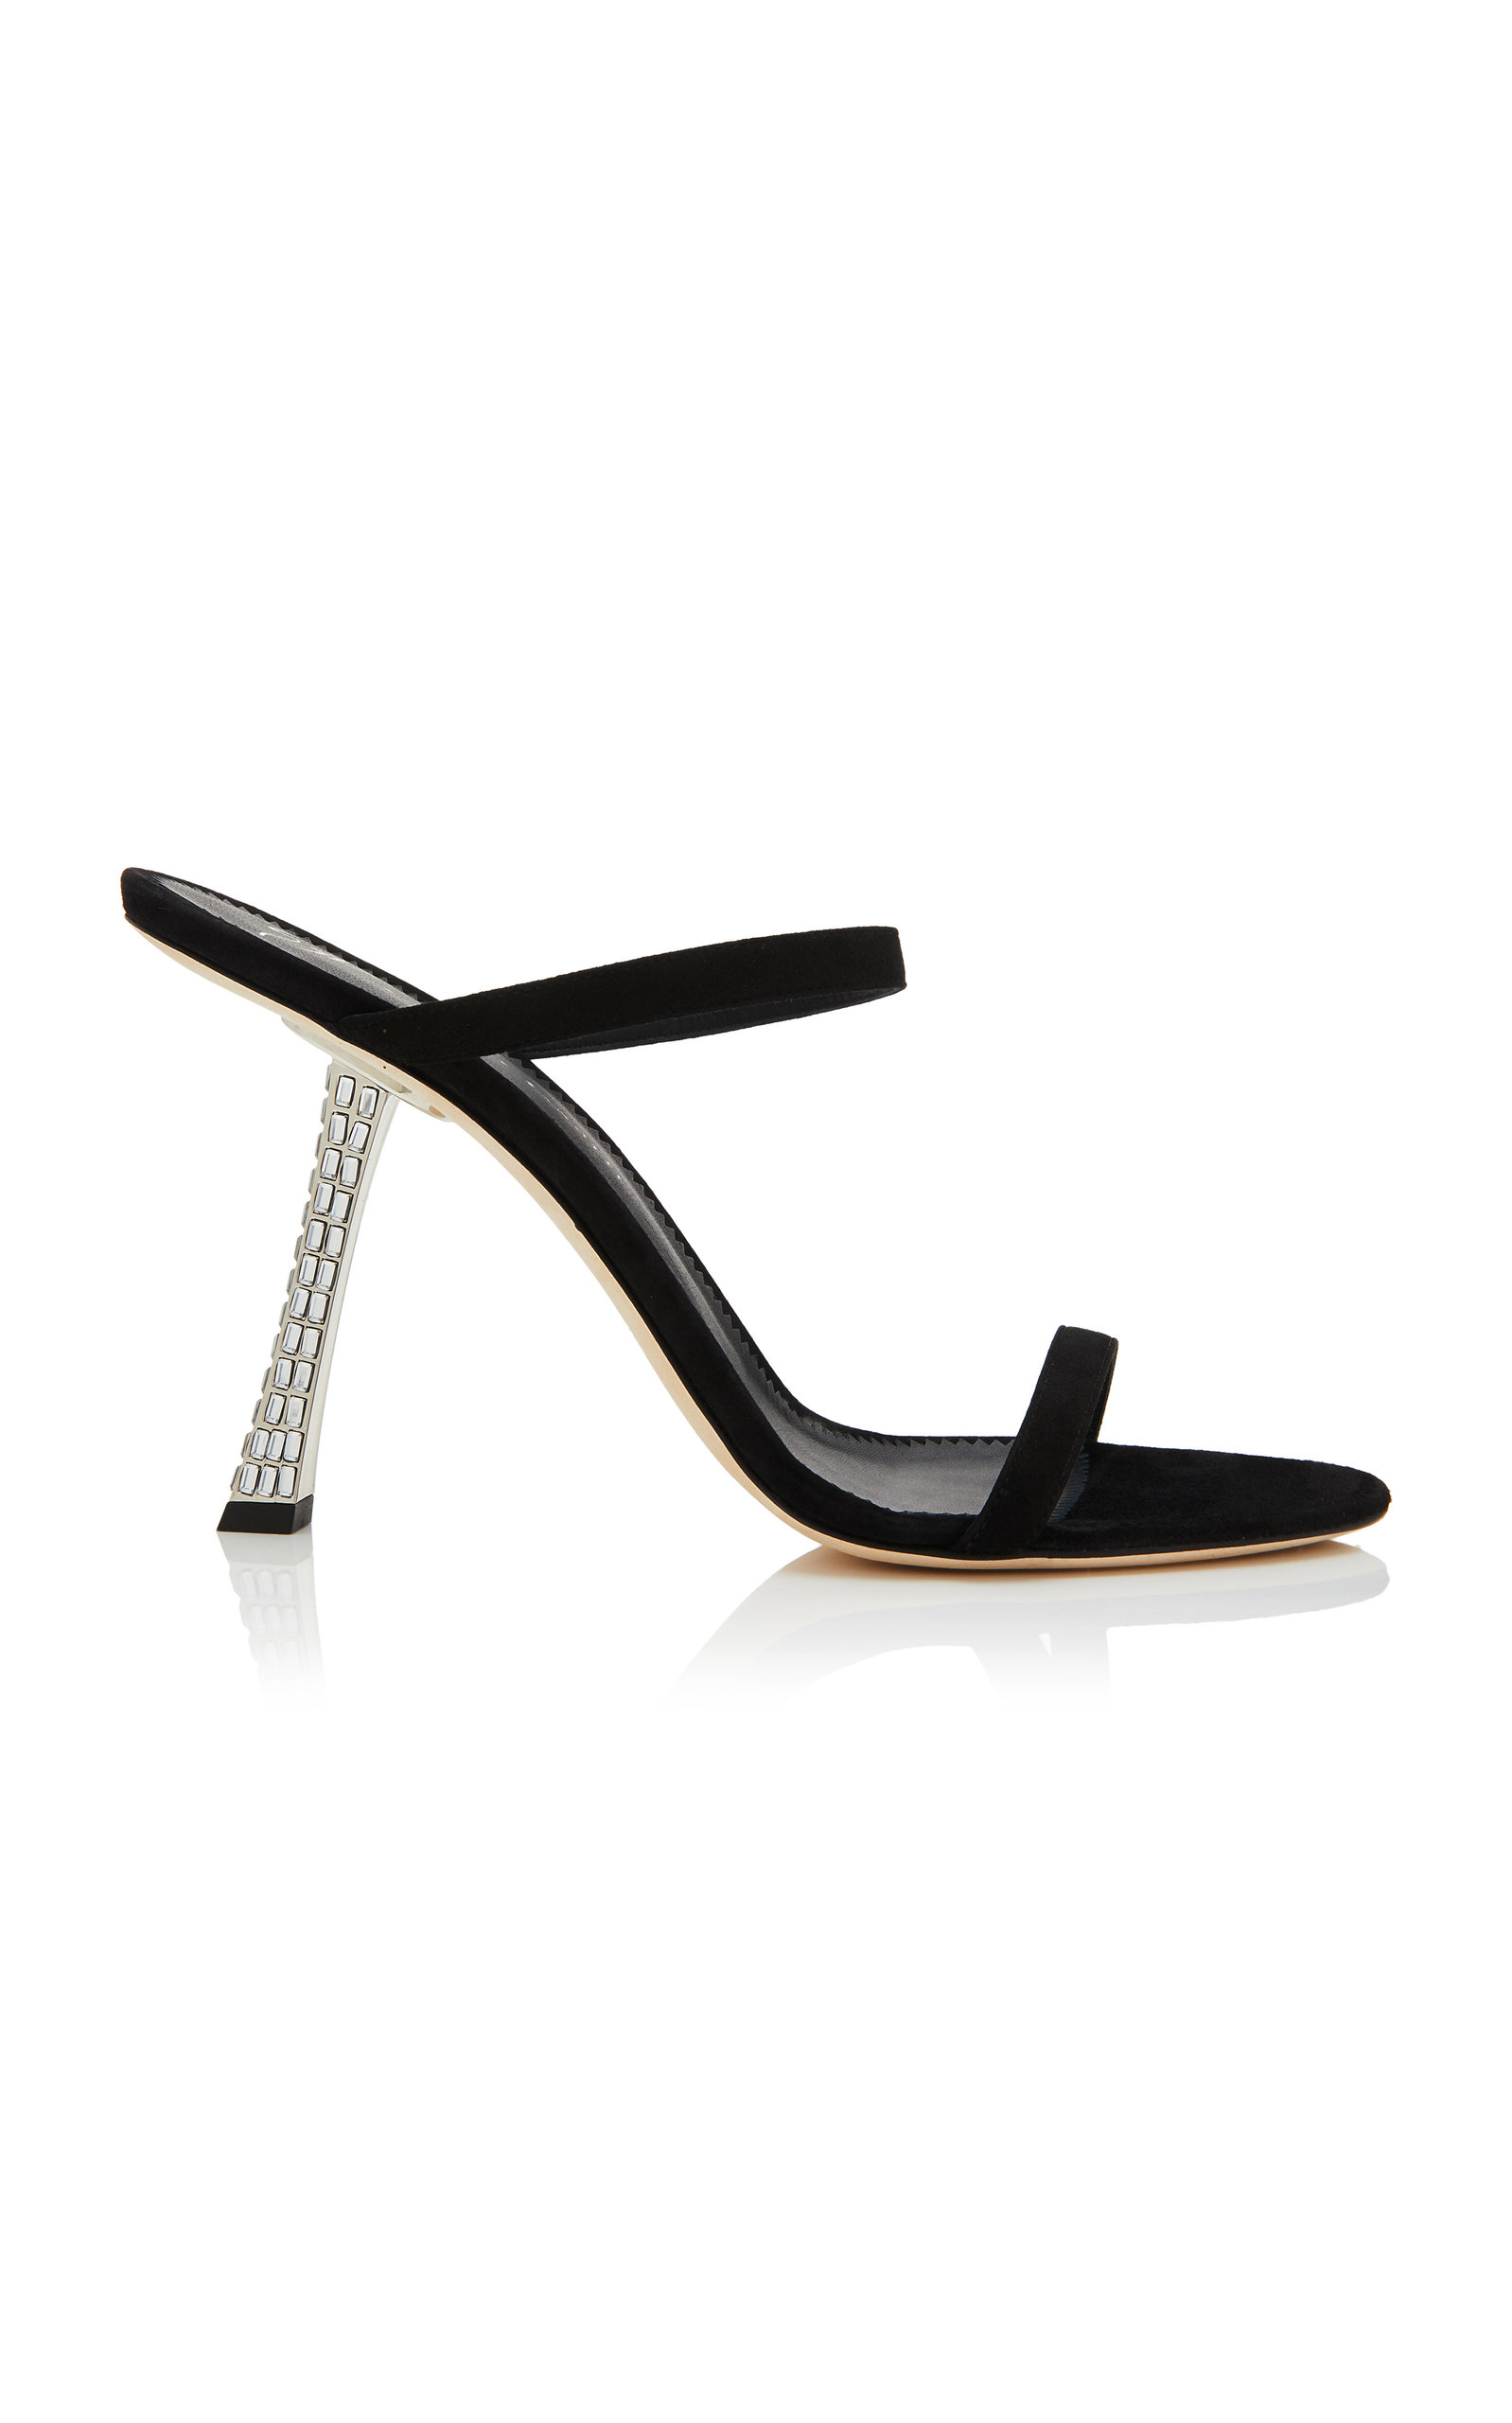 39231014769b9 Crystal-Embellished Suede Sandals by Giuseppe Zanotti | Moda Operandi